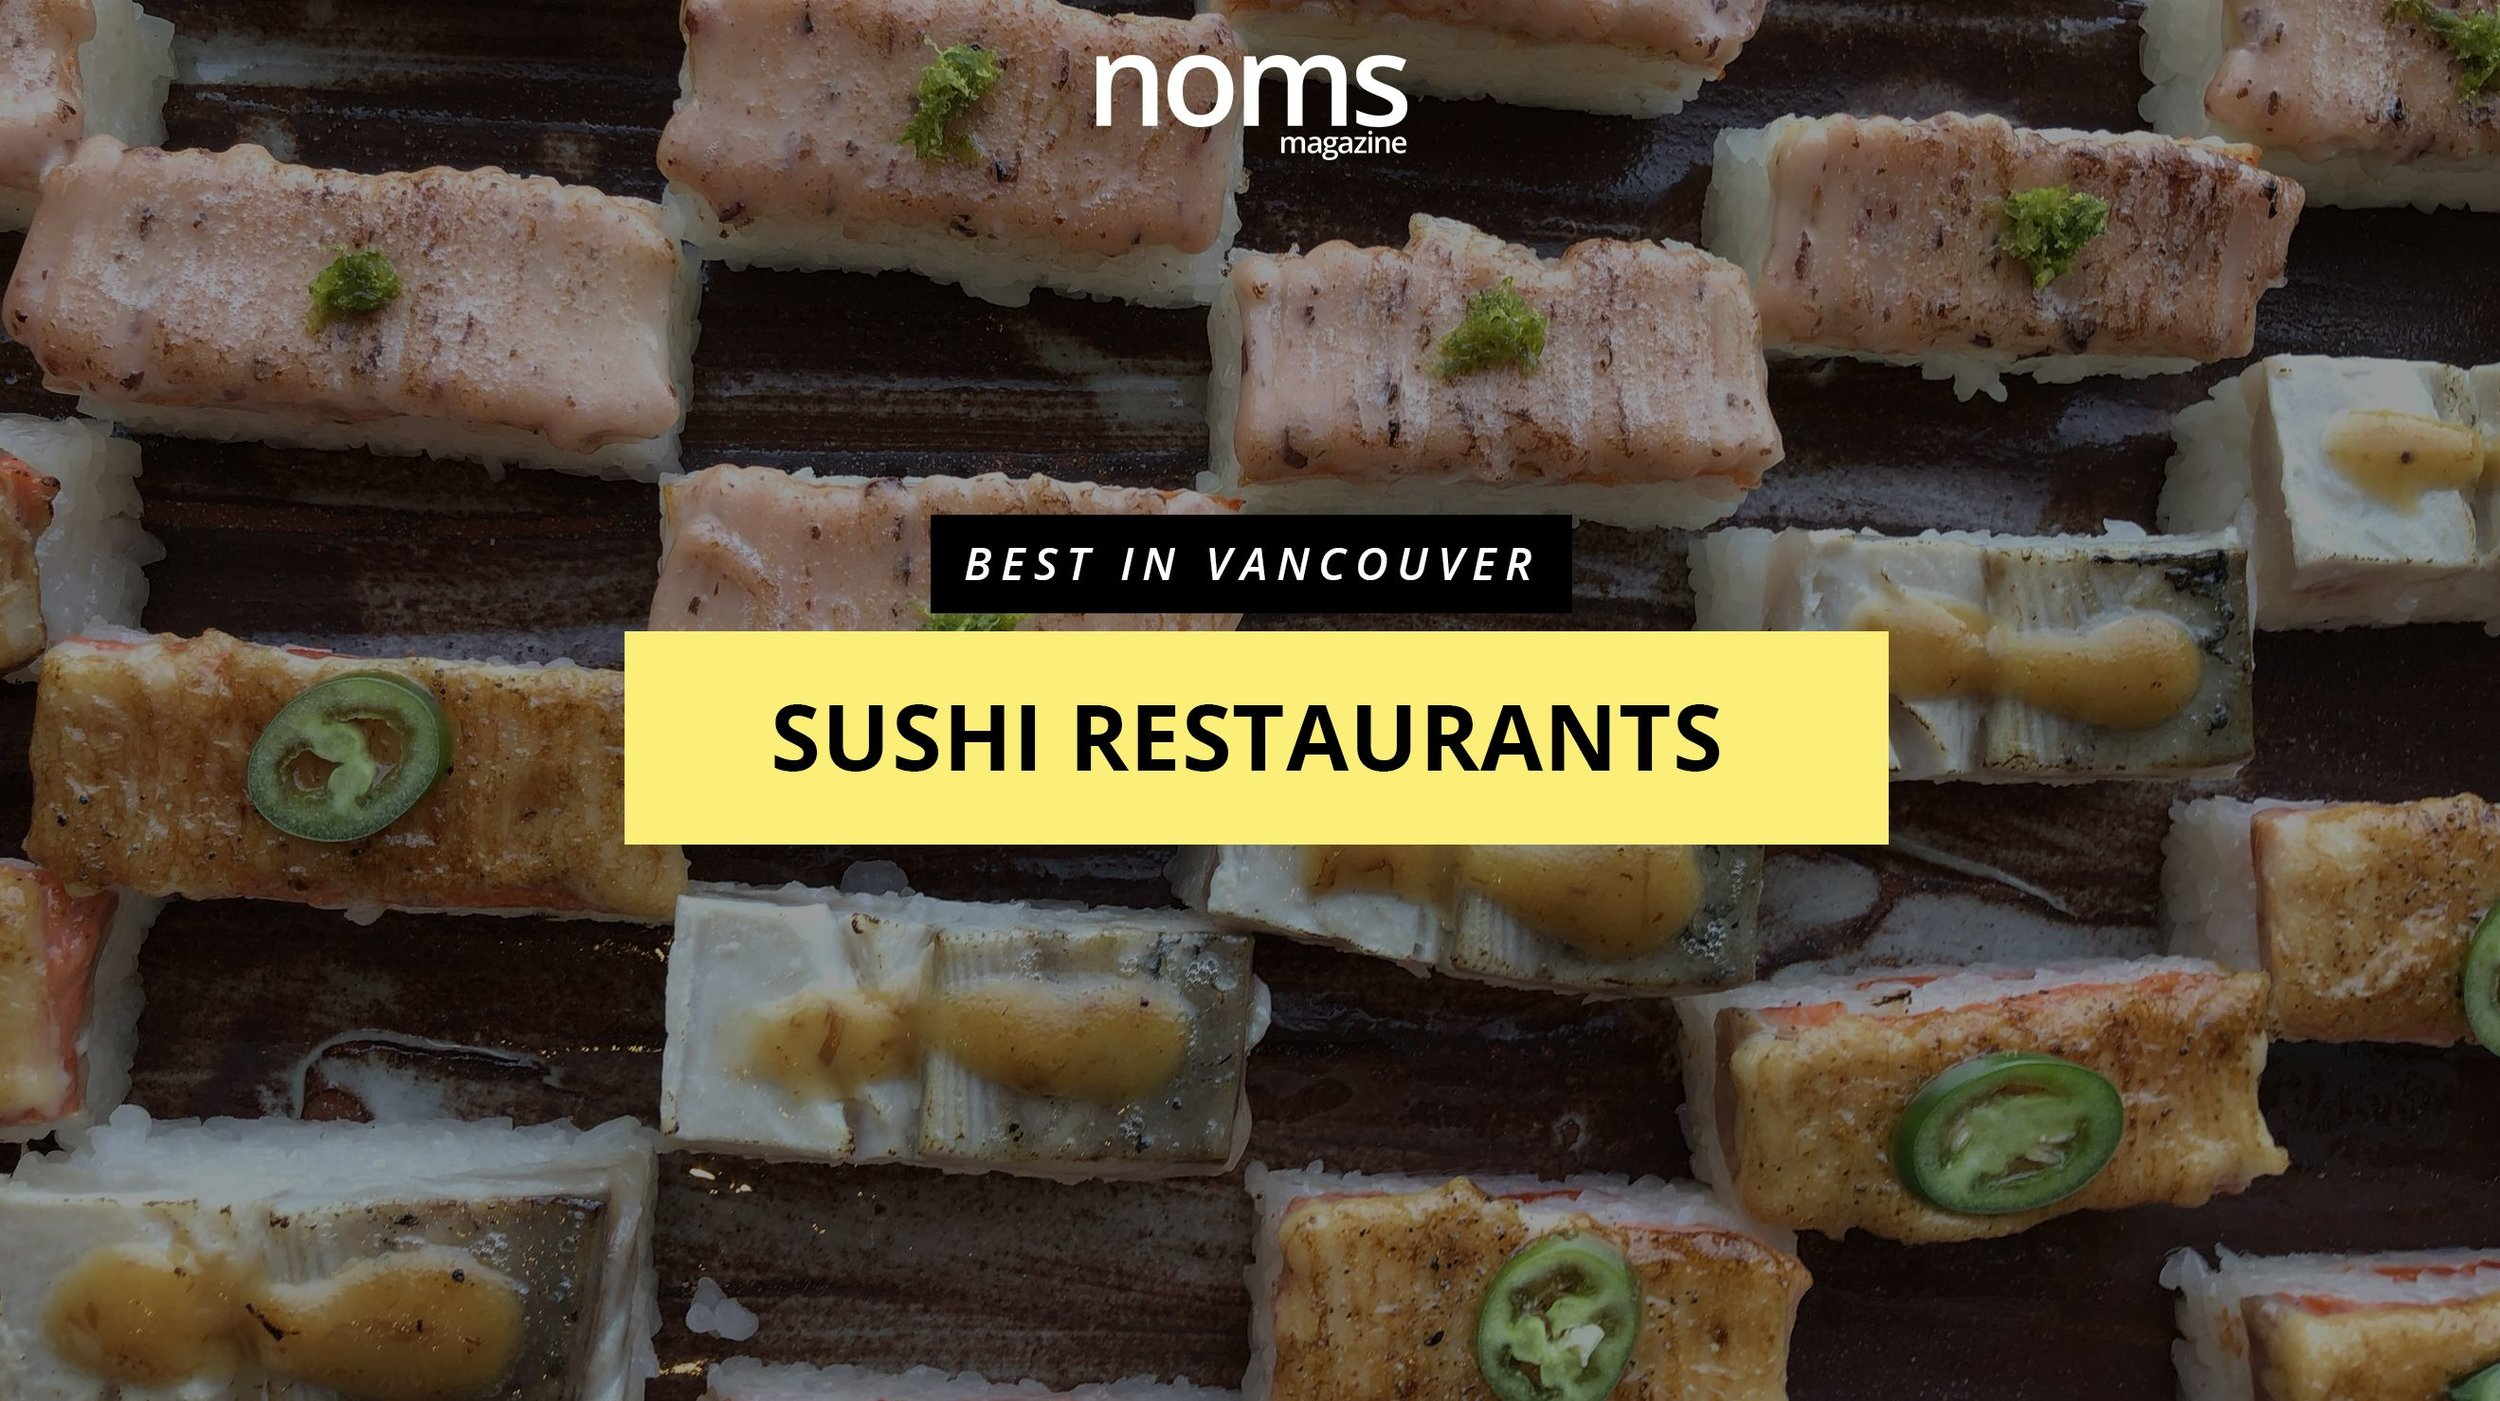 Bestinvancouver--sushi-restaurants-websiteheader-nomsmag.jpg